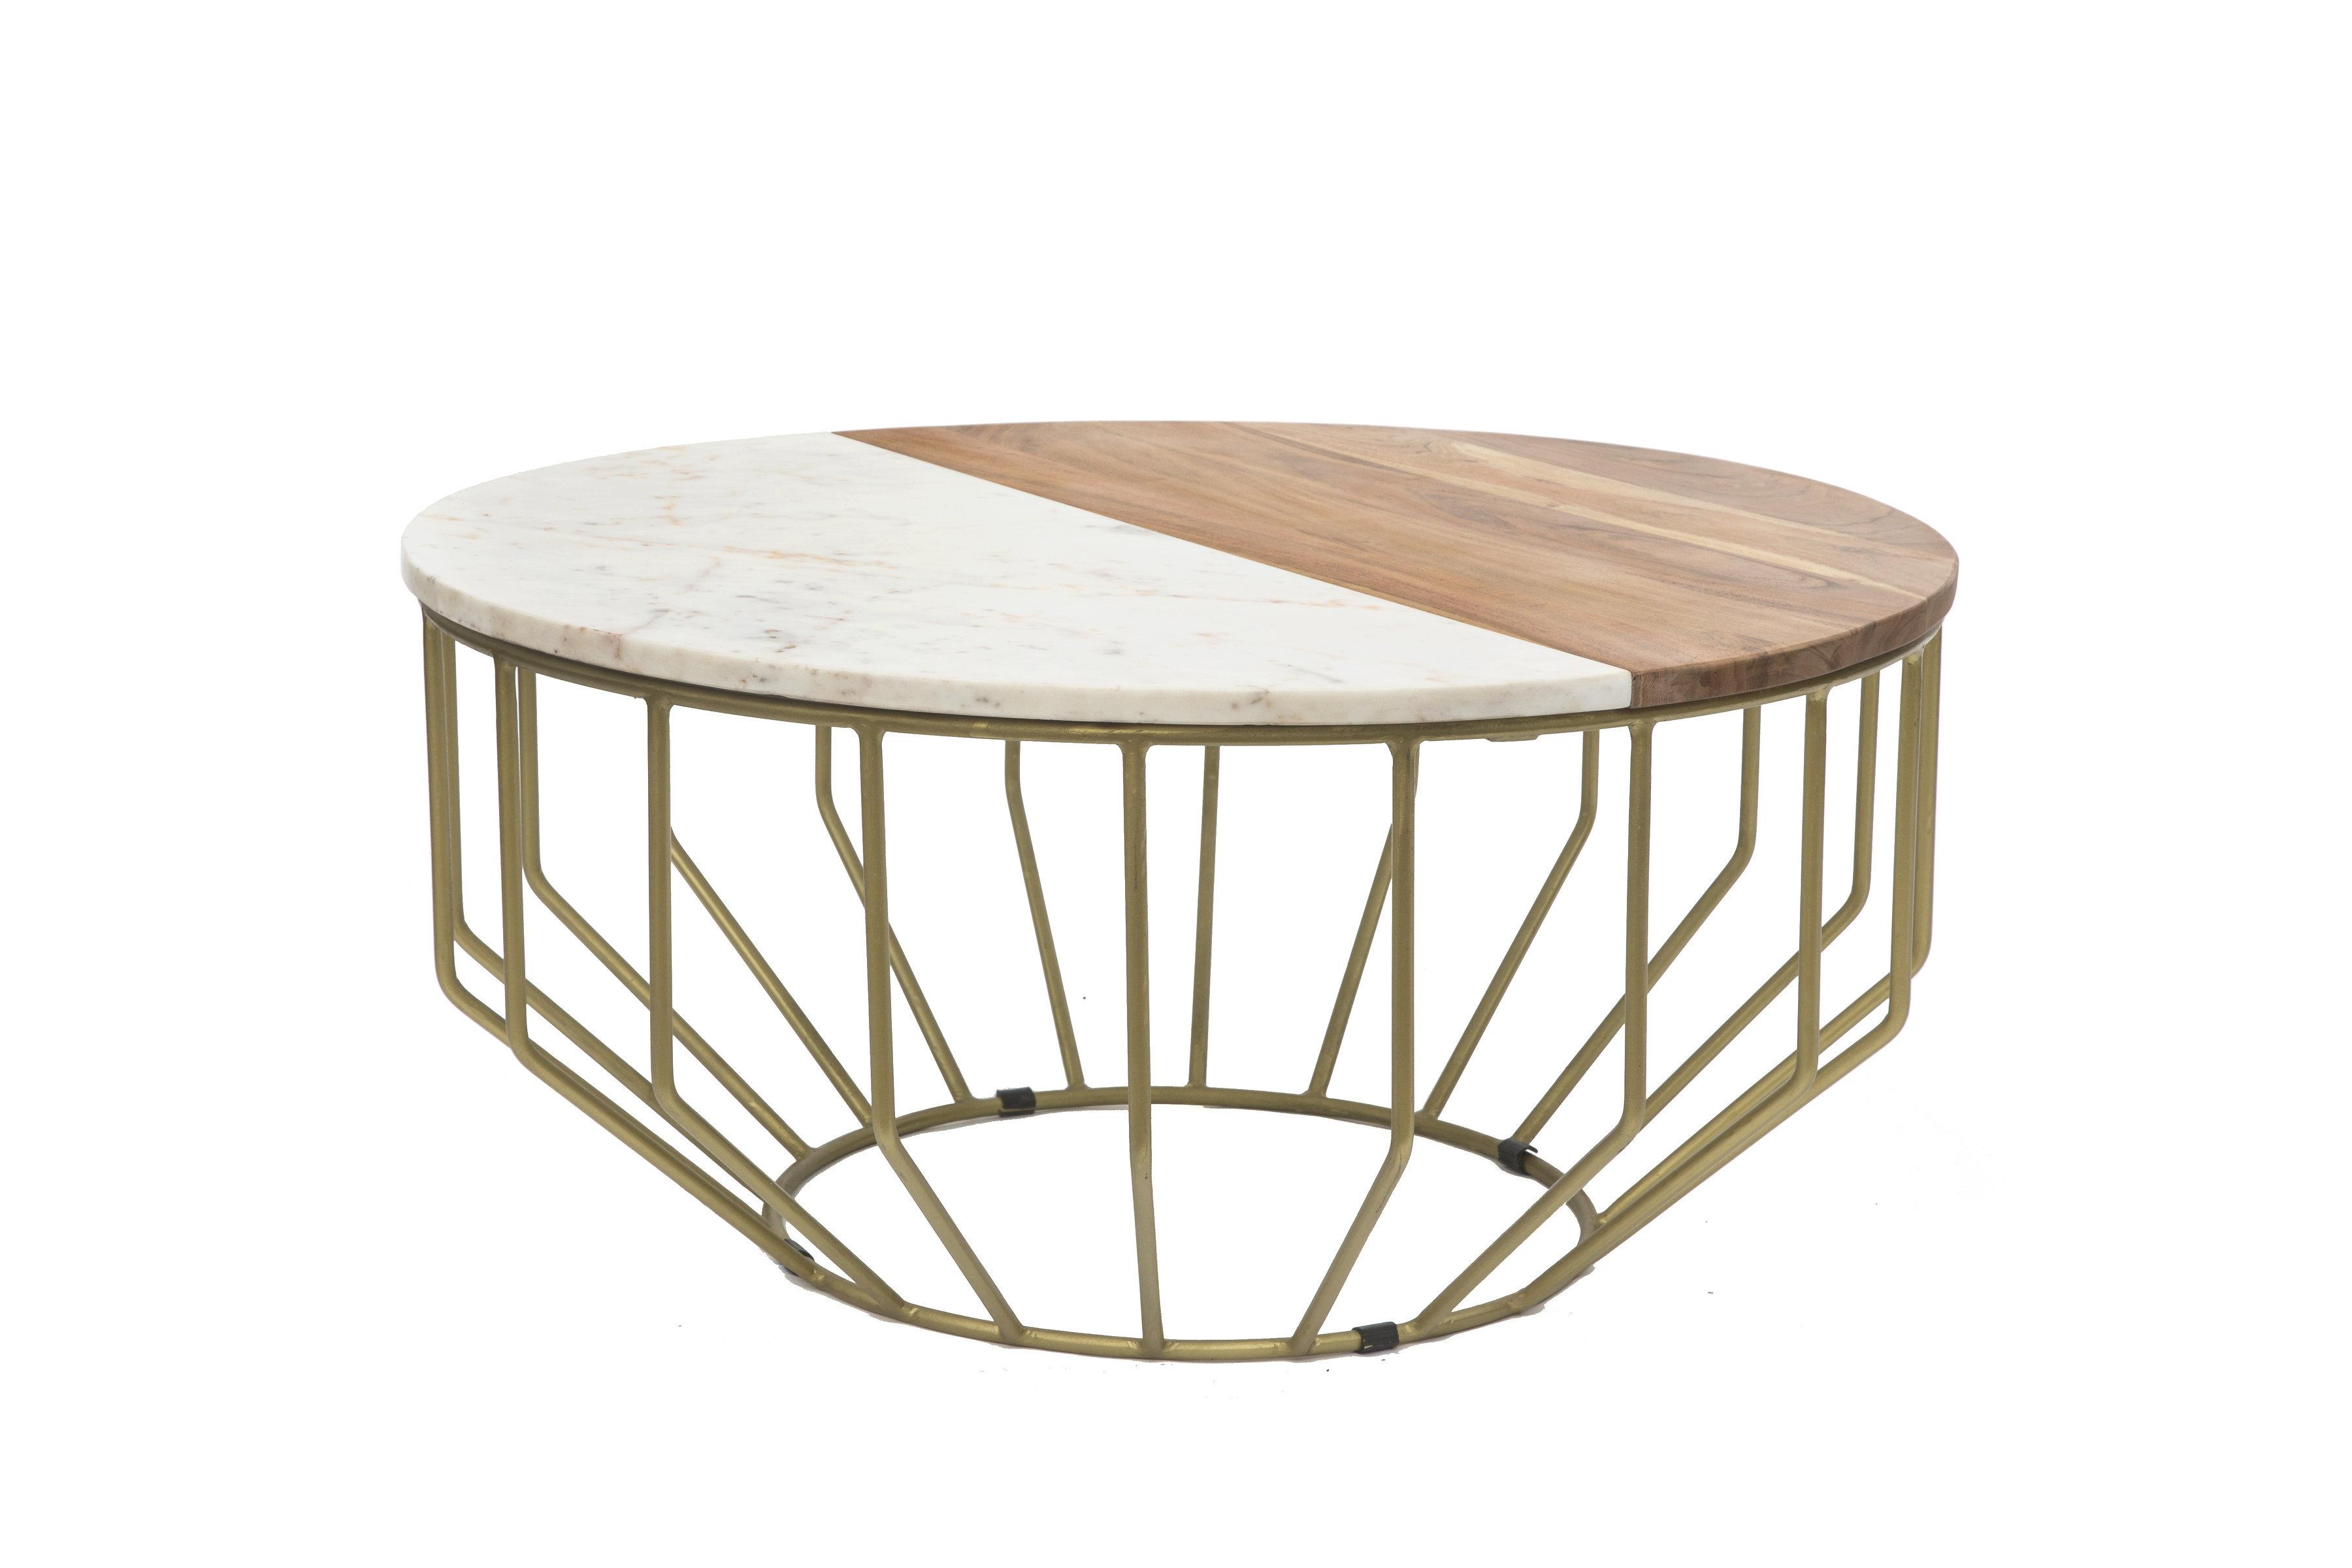 Everly Quinn Singh Woodmarble Round Coffee Table Wayfair